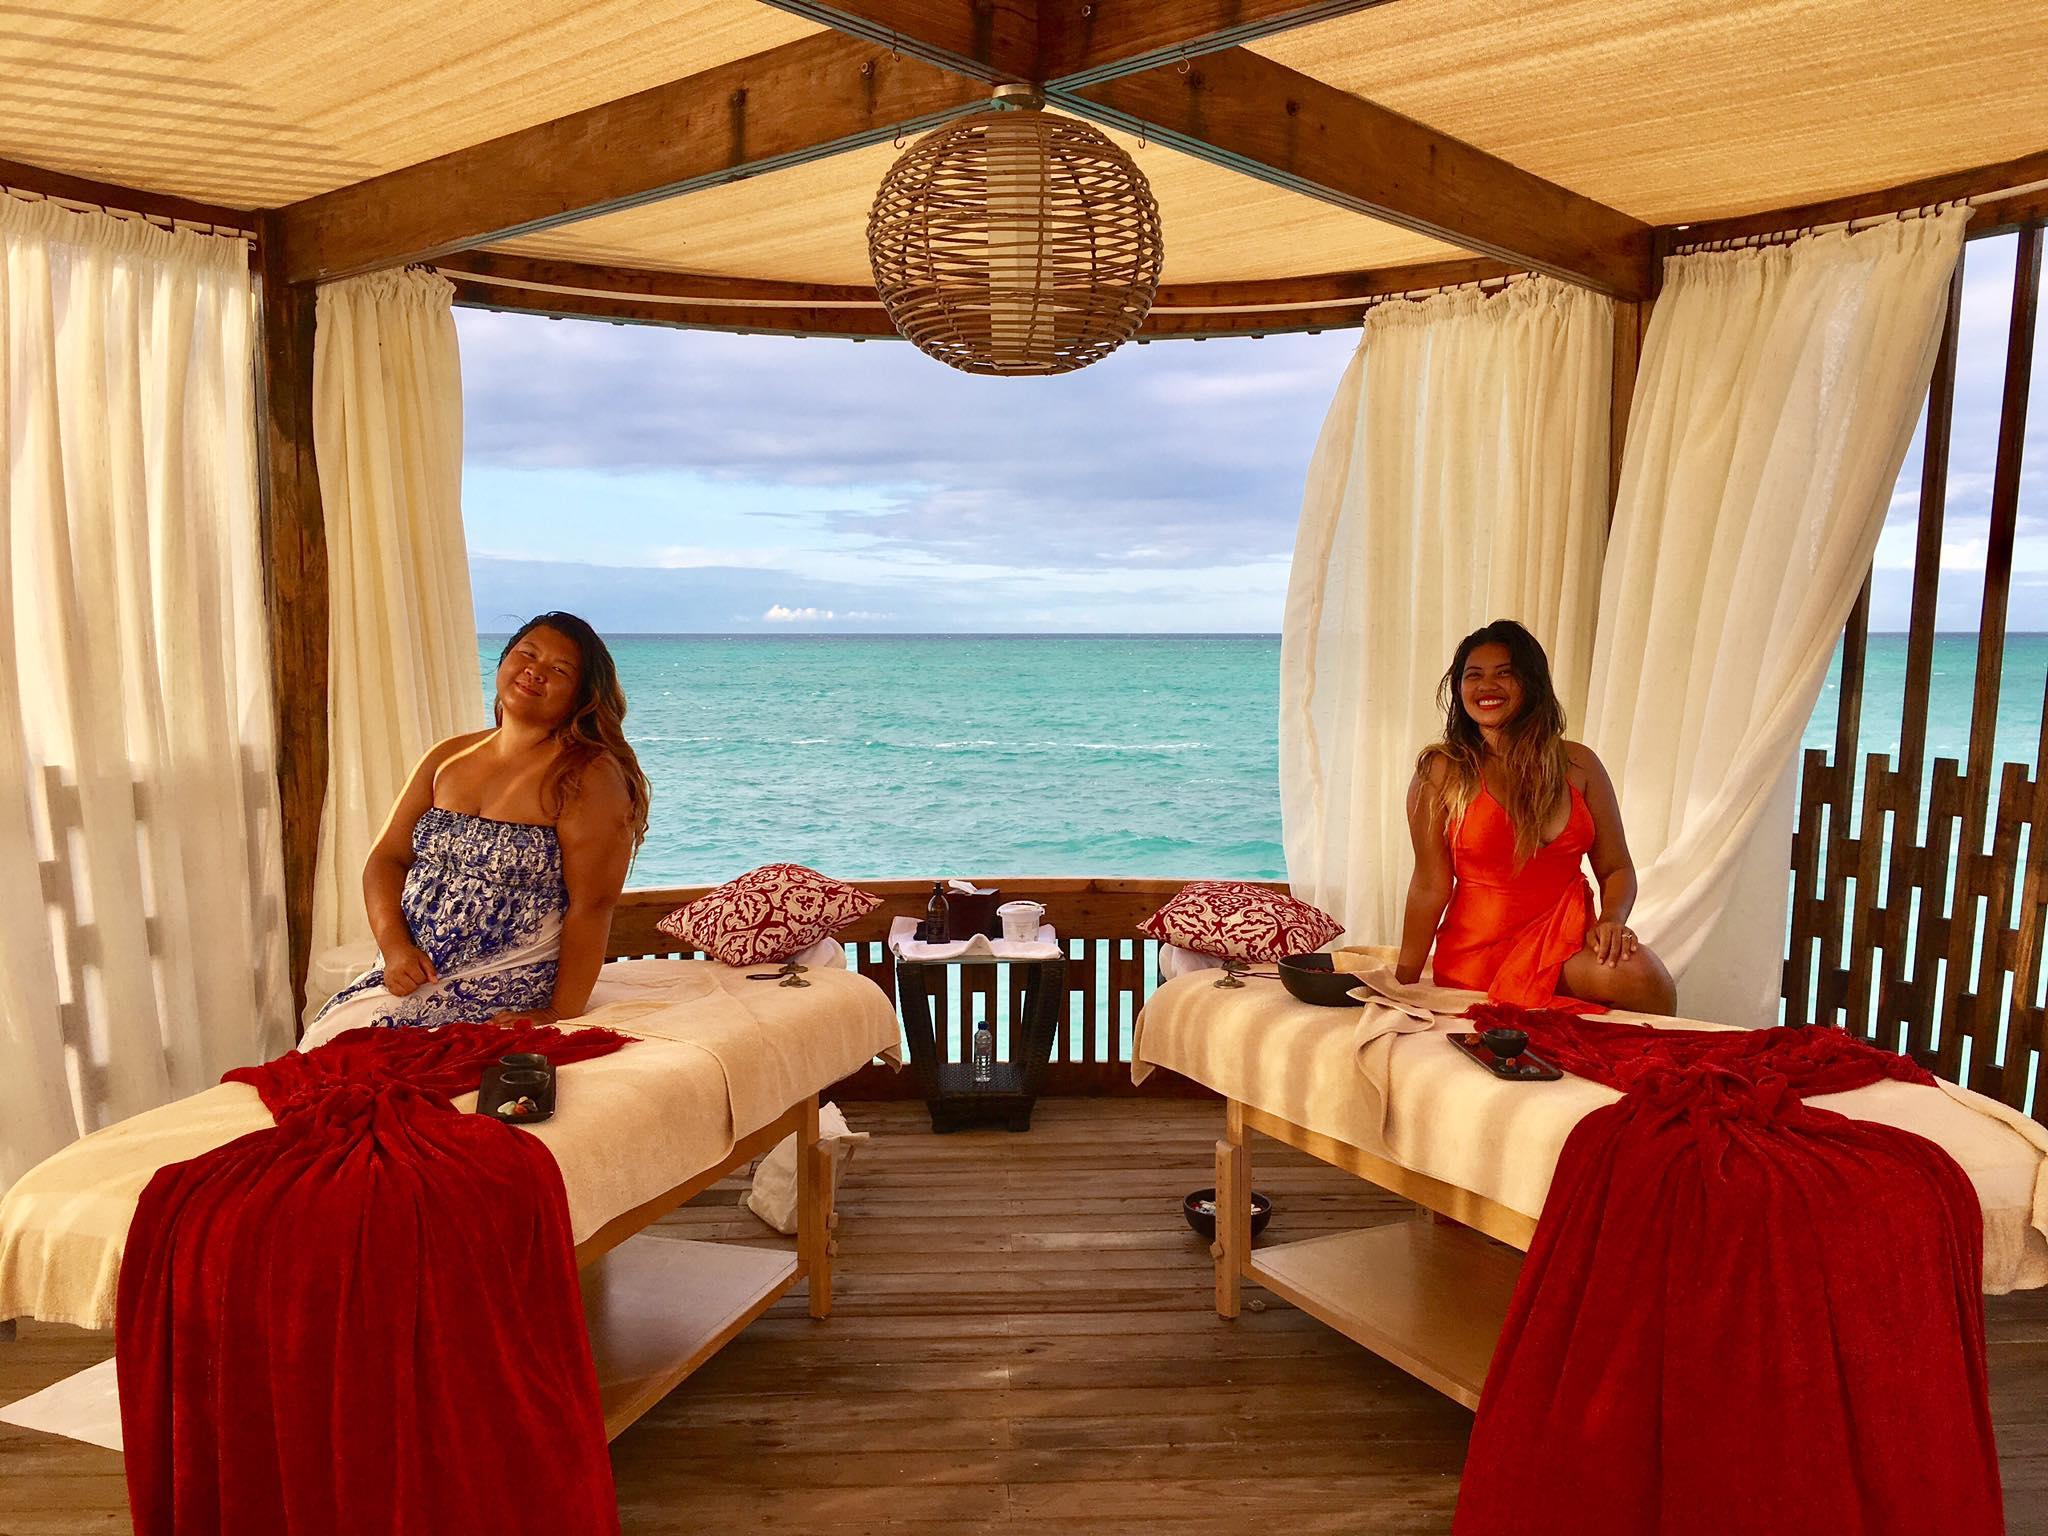 Luxury On The Grandest Scale at Essque Zalu Zanzibar 4.jpg